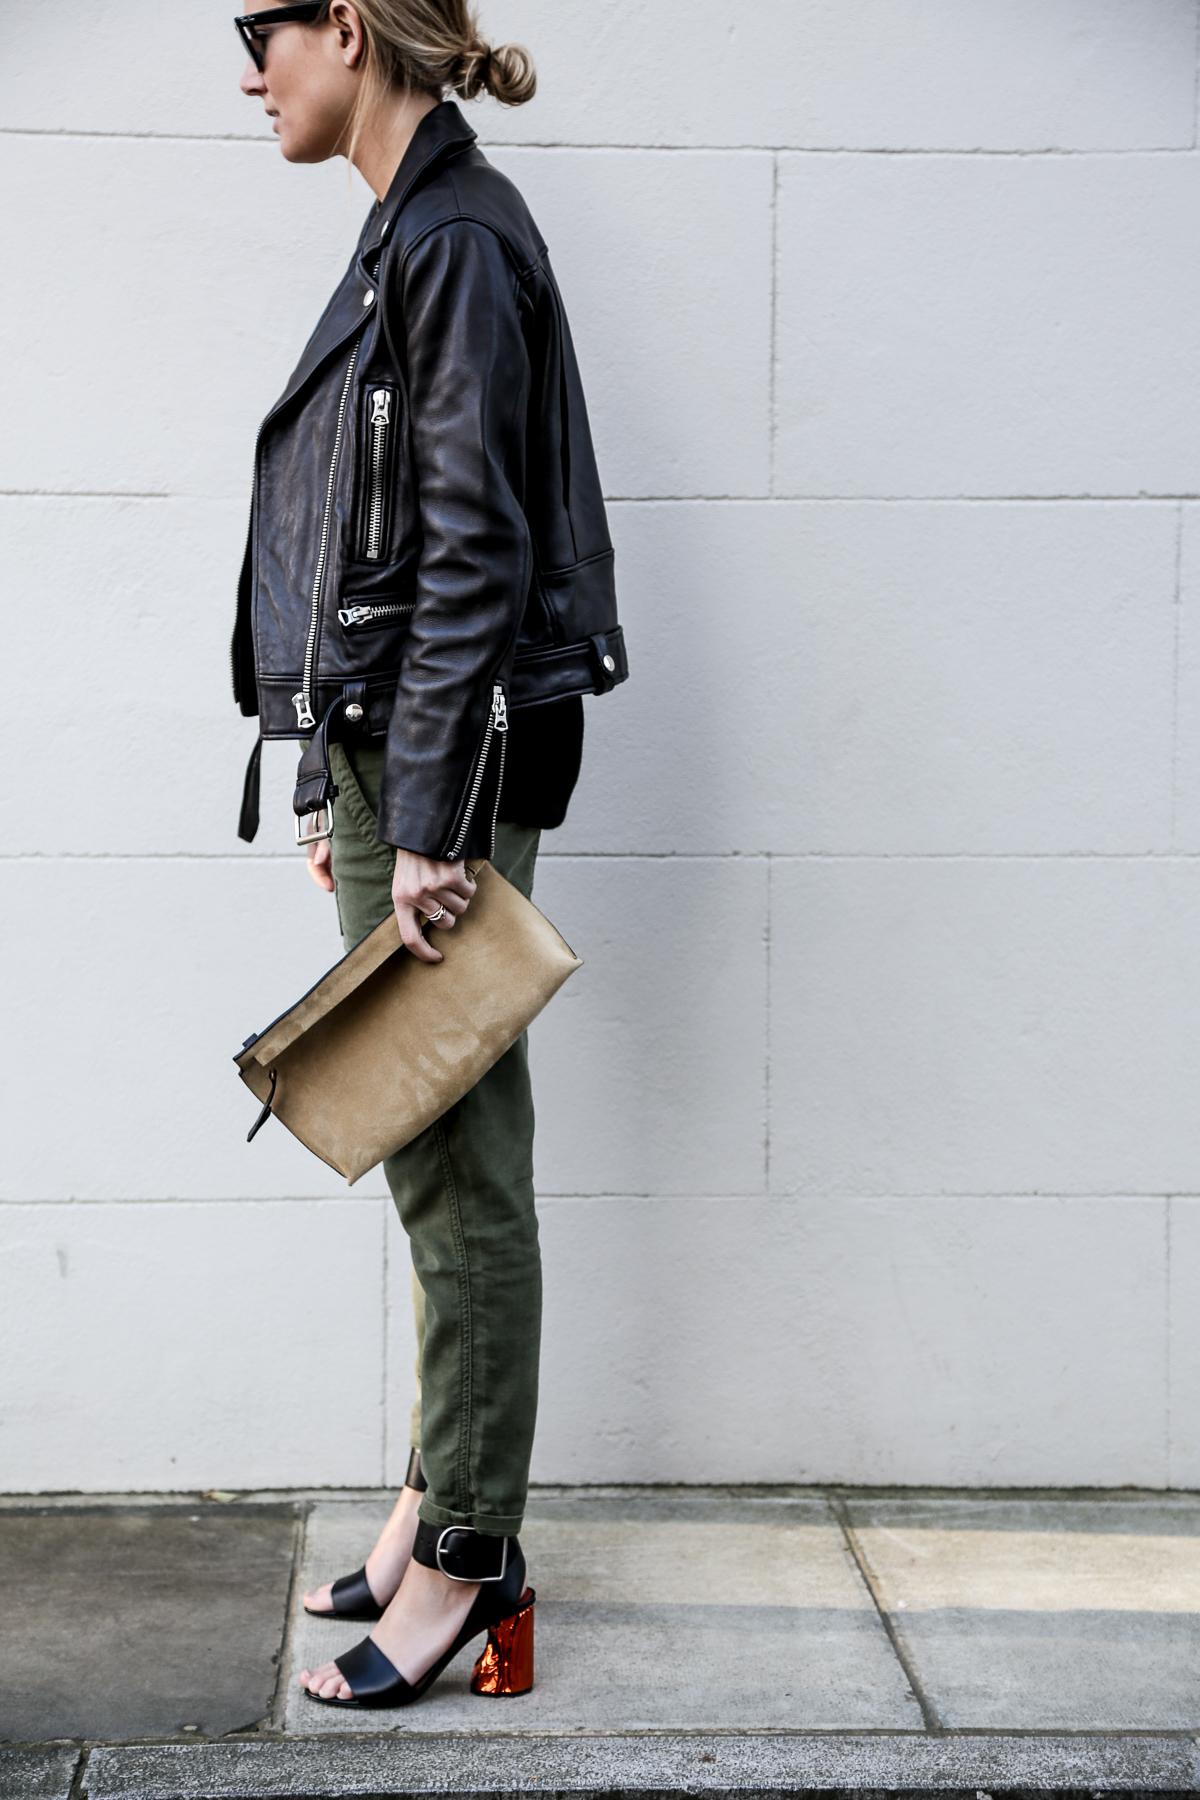 Fashion designer how to become 51